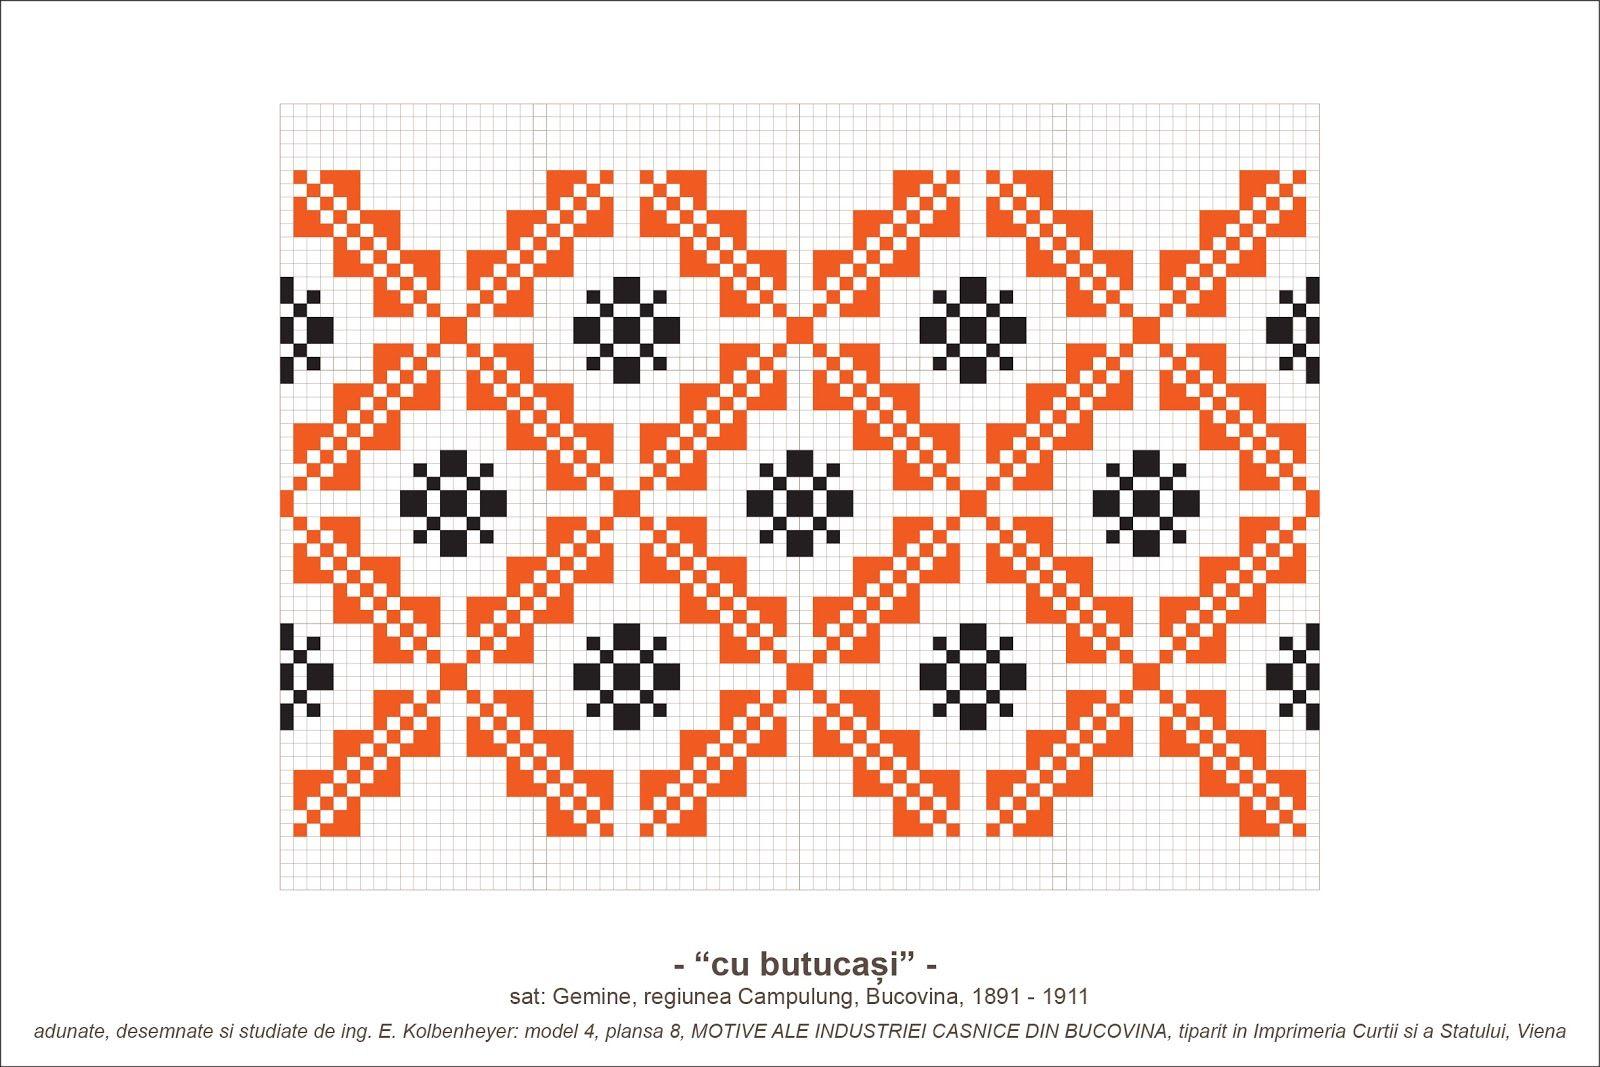 BUKOWINA+-+plansa+8+-+model+4+-+cu+butucasi.jpg (1600×1067)